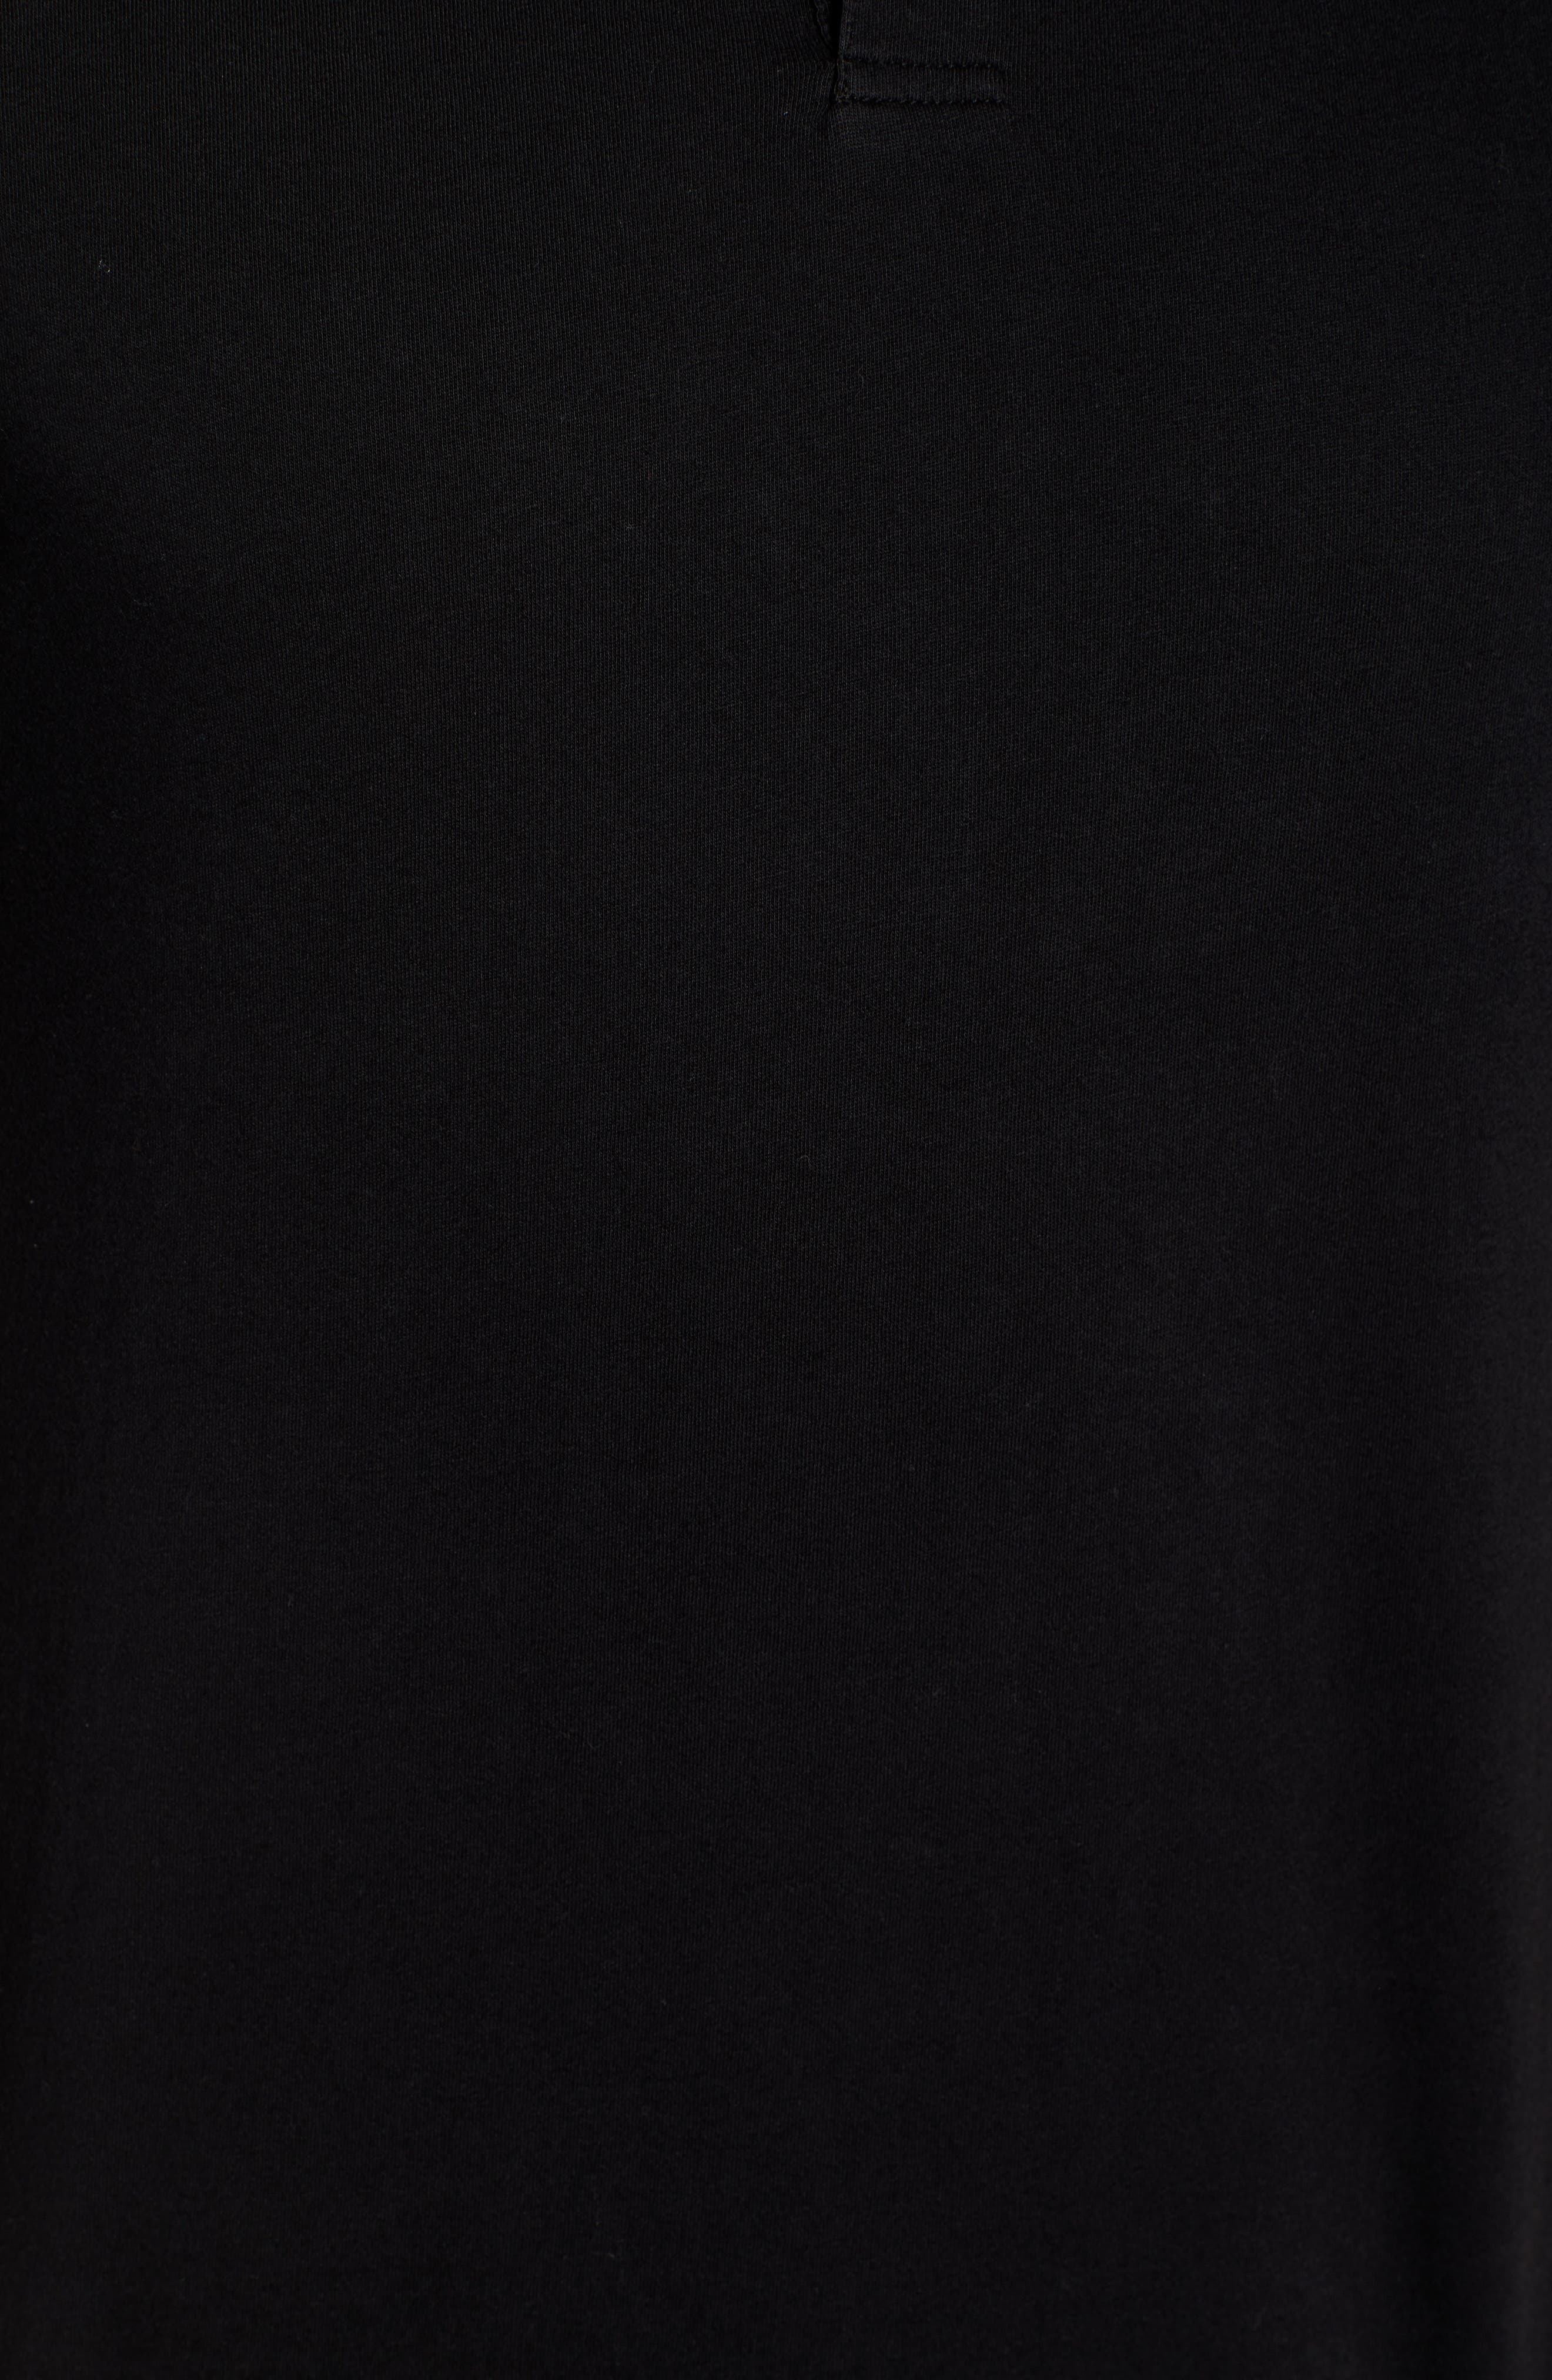 Regular Fit Jersey Polo,                             Alternate thumbnail 5, color,                             BLACK